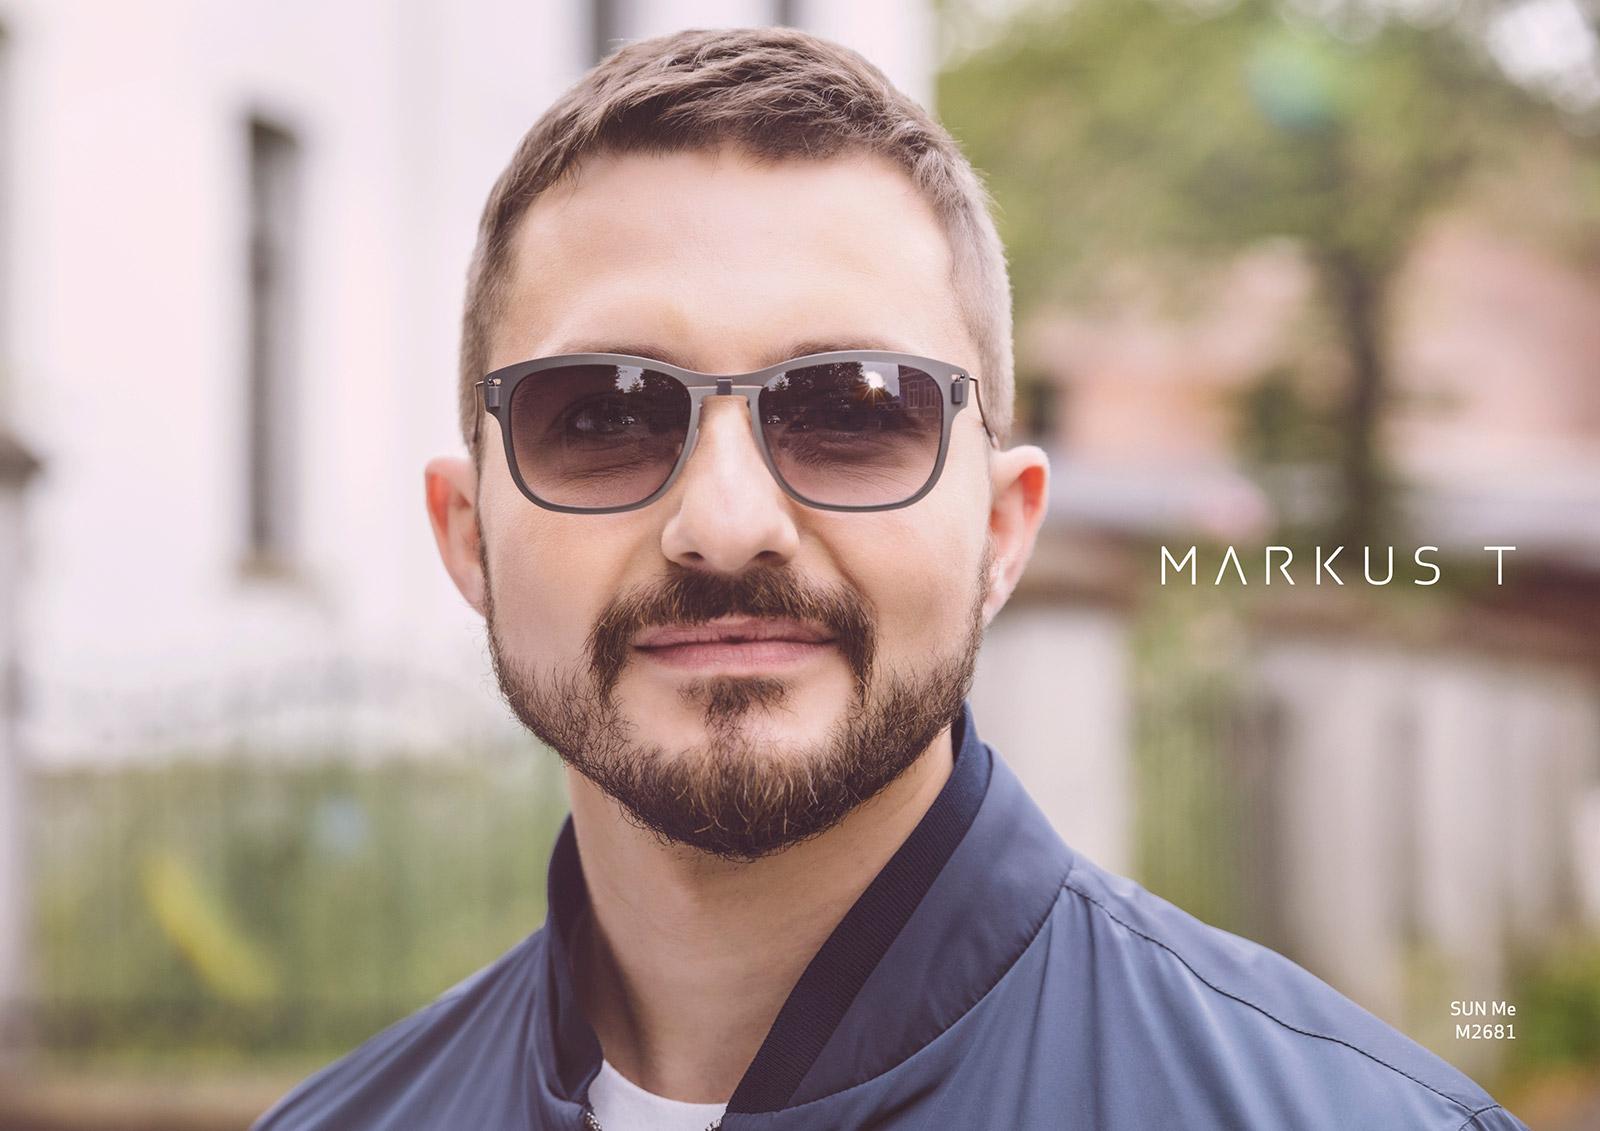 © Markus Temming GmbH